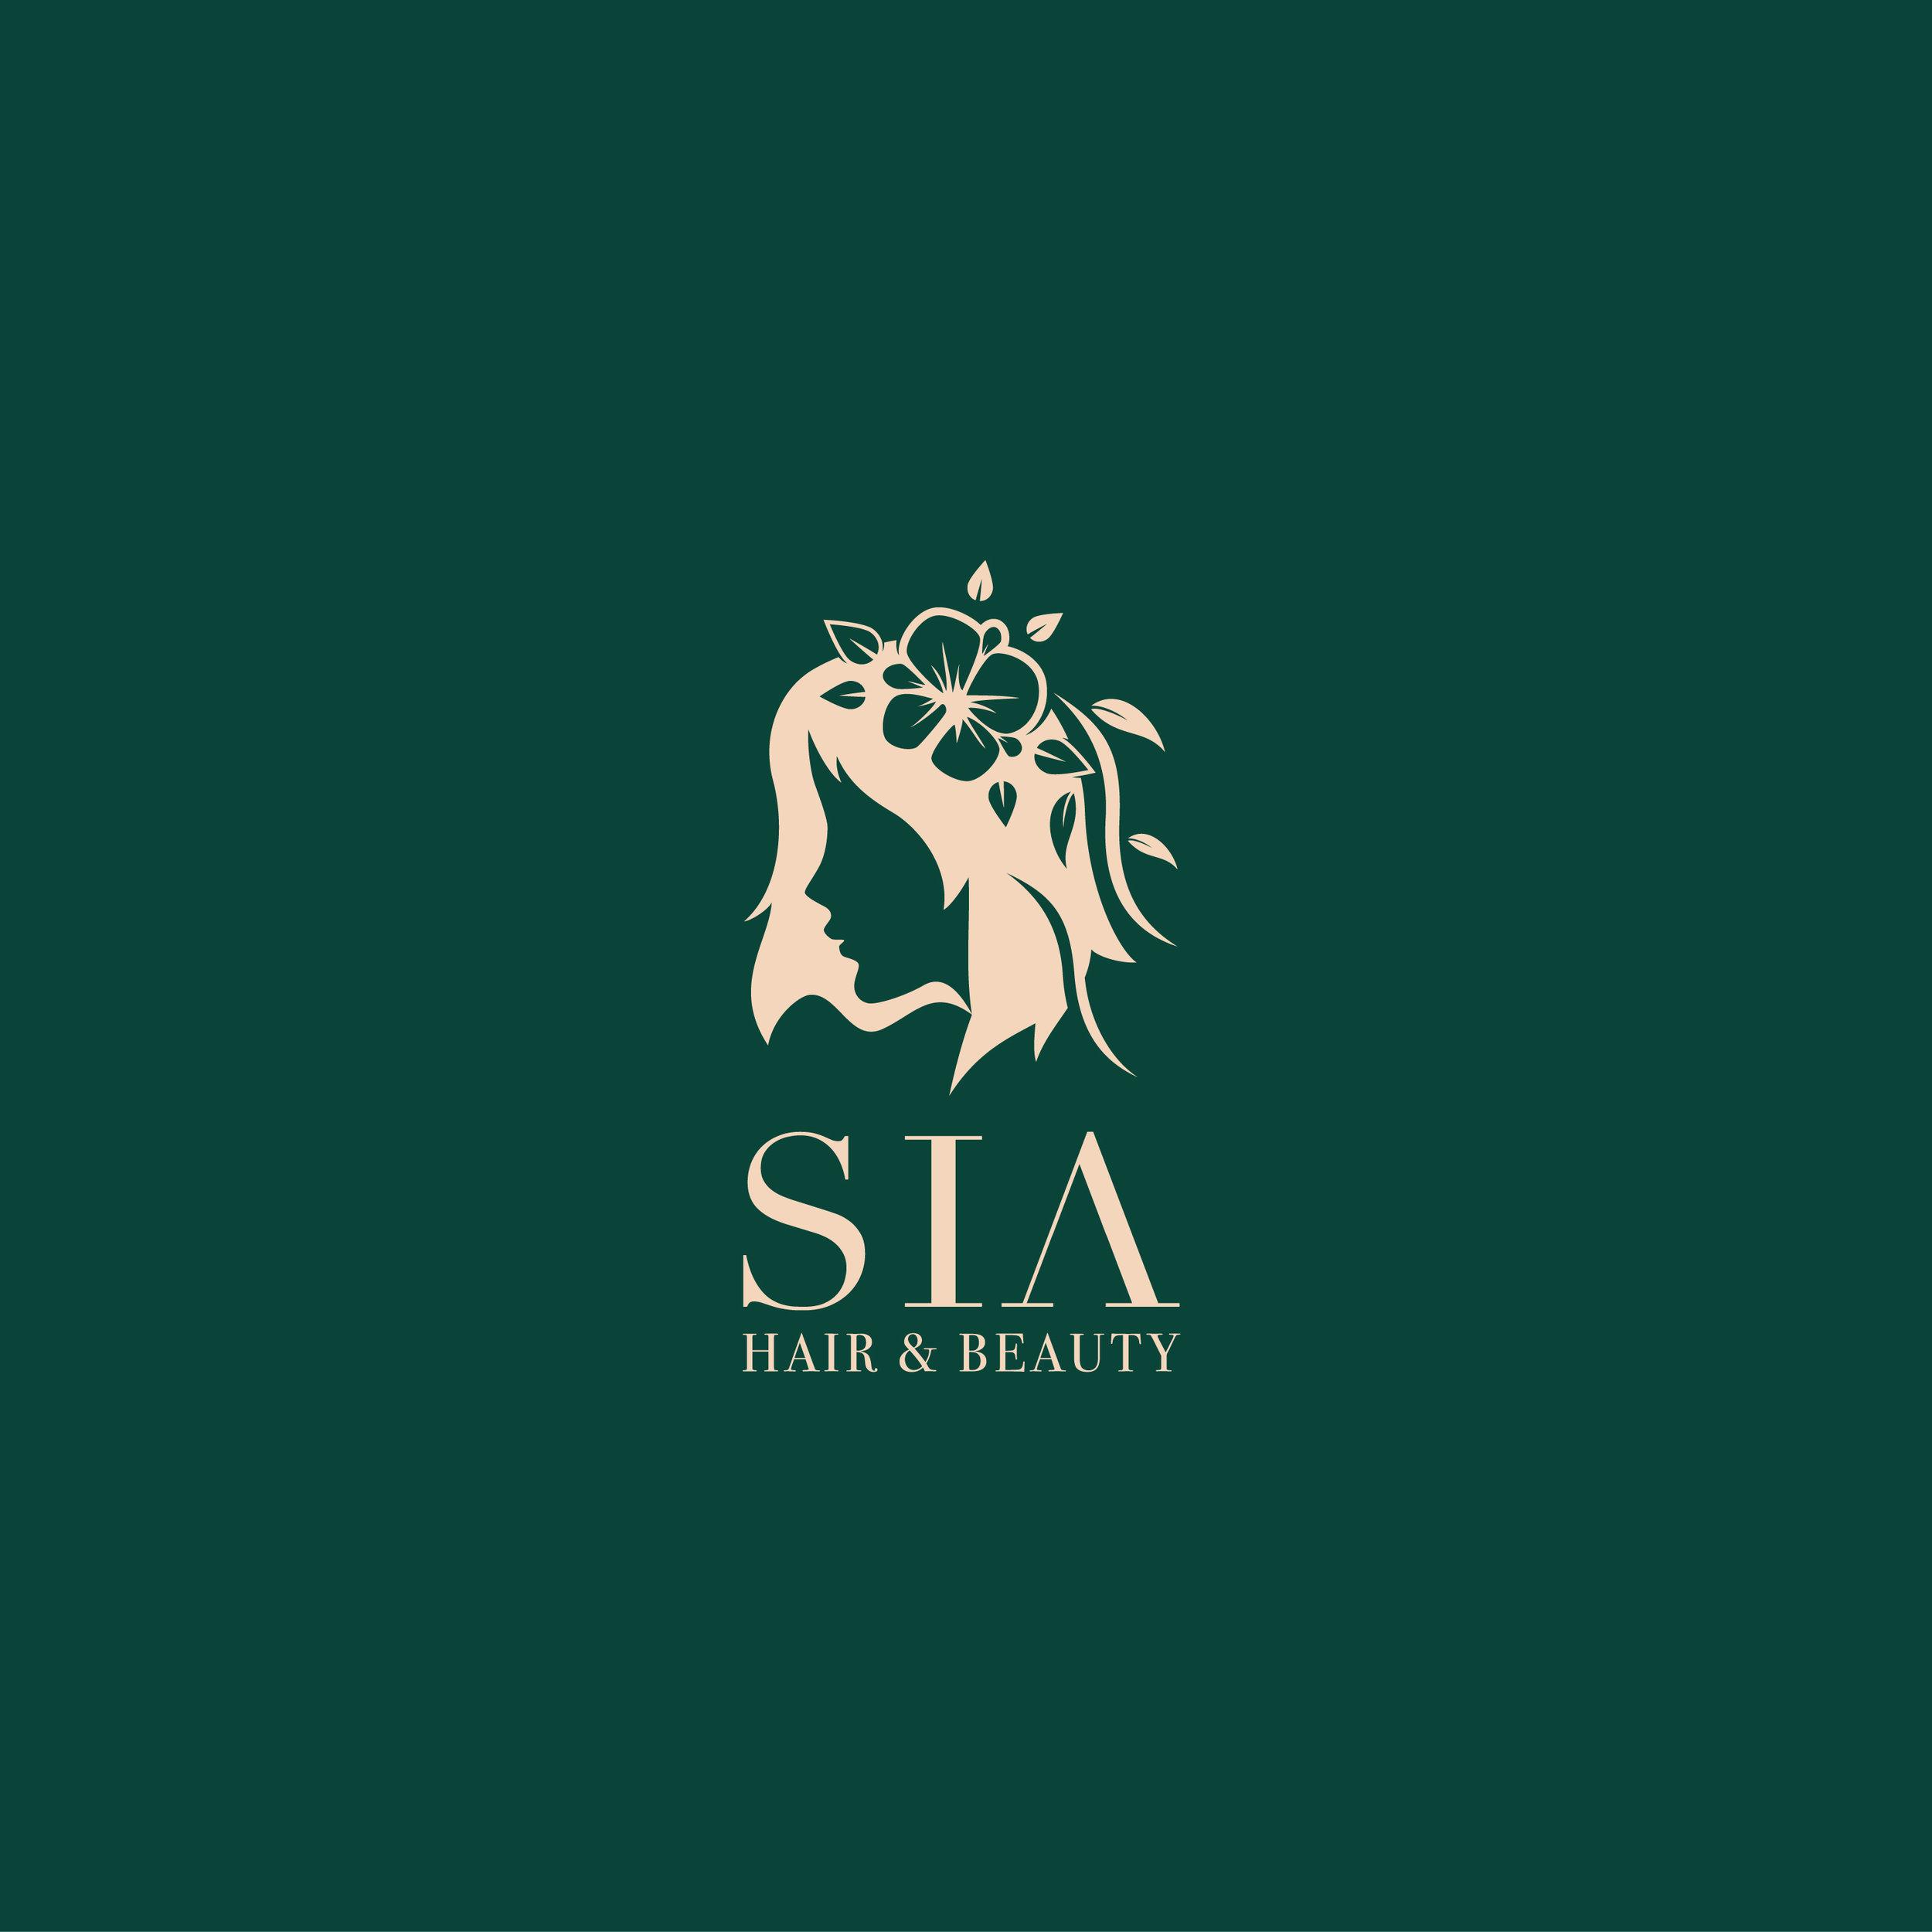 SIA-3.jpg